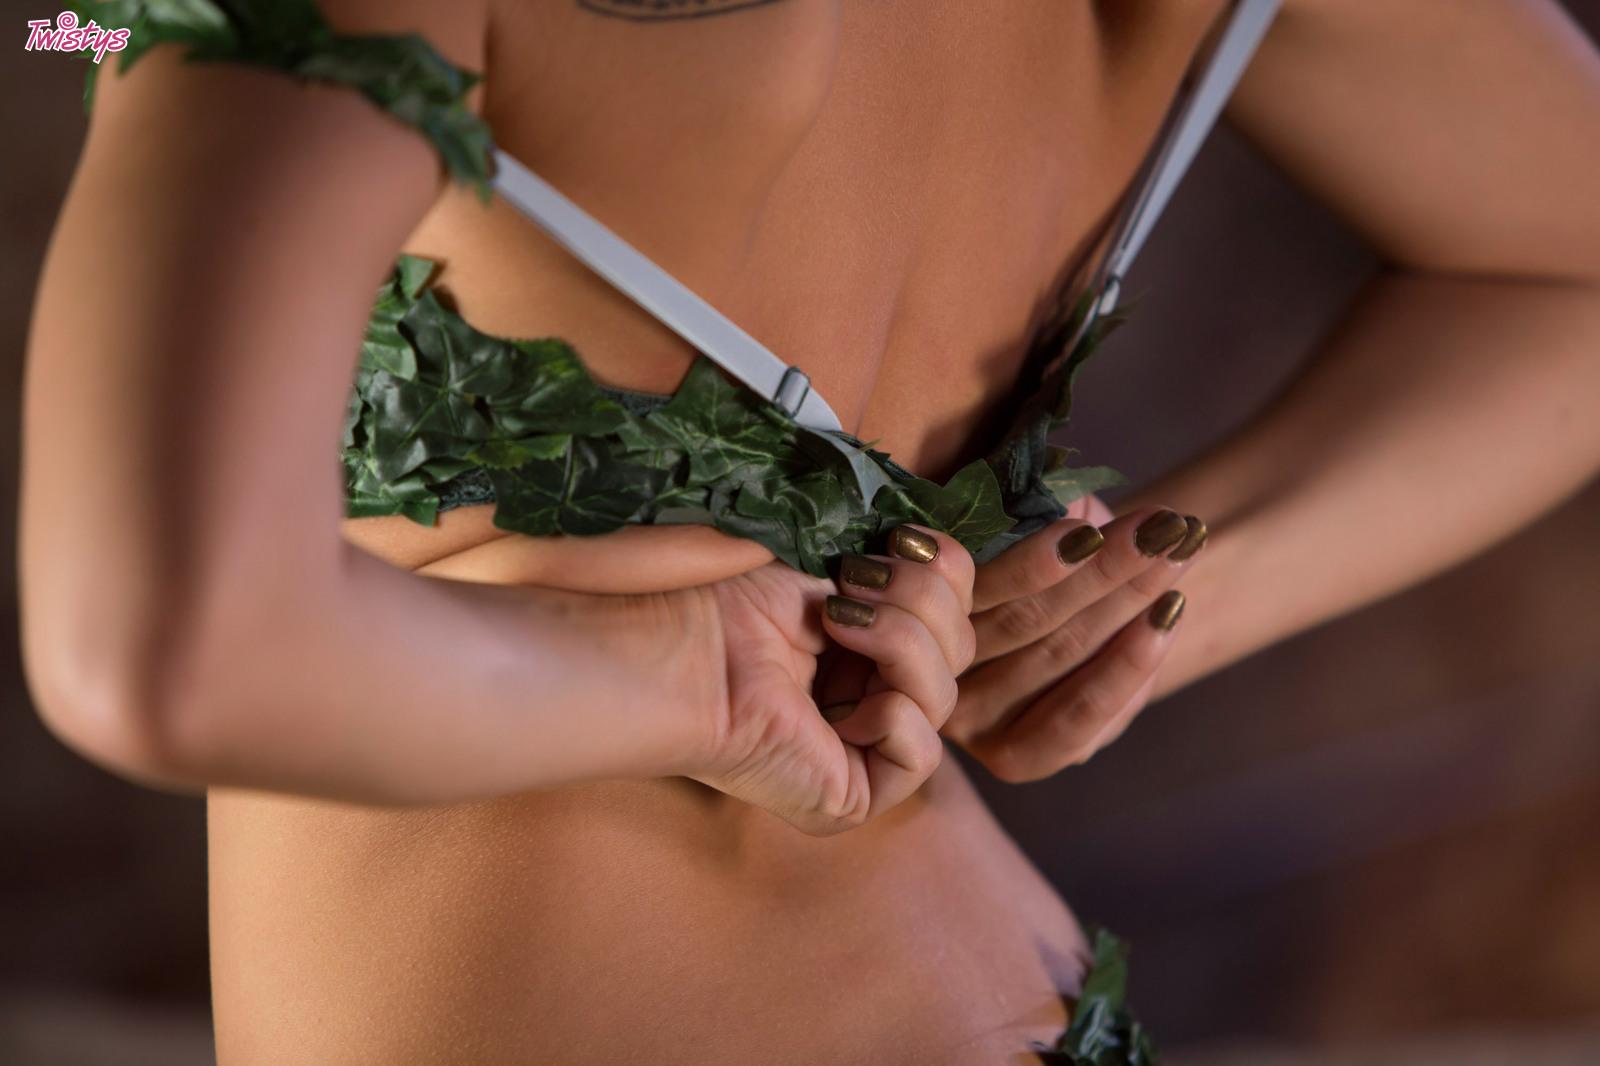 Aydra Fox Cosplay Porn Pics aidra fox enjoys stripping off her pretty costume 52271